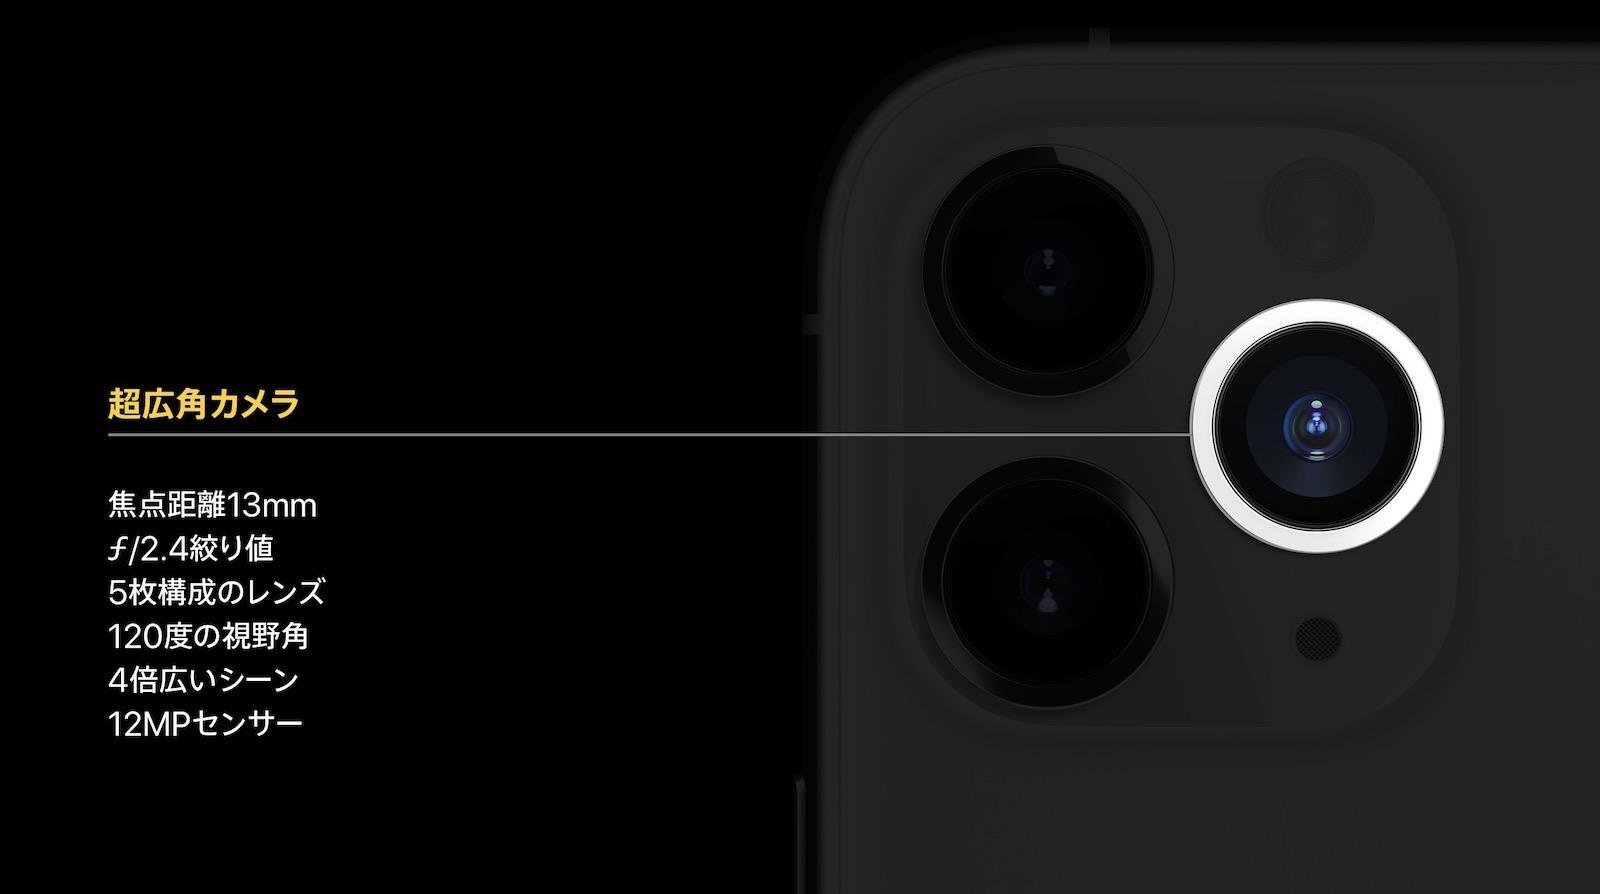 iPhone 11 Pro 超広角カメラ